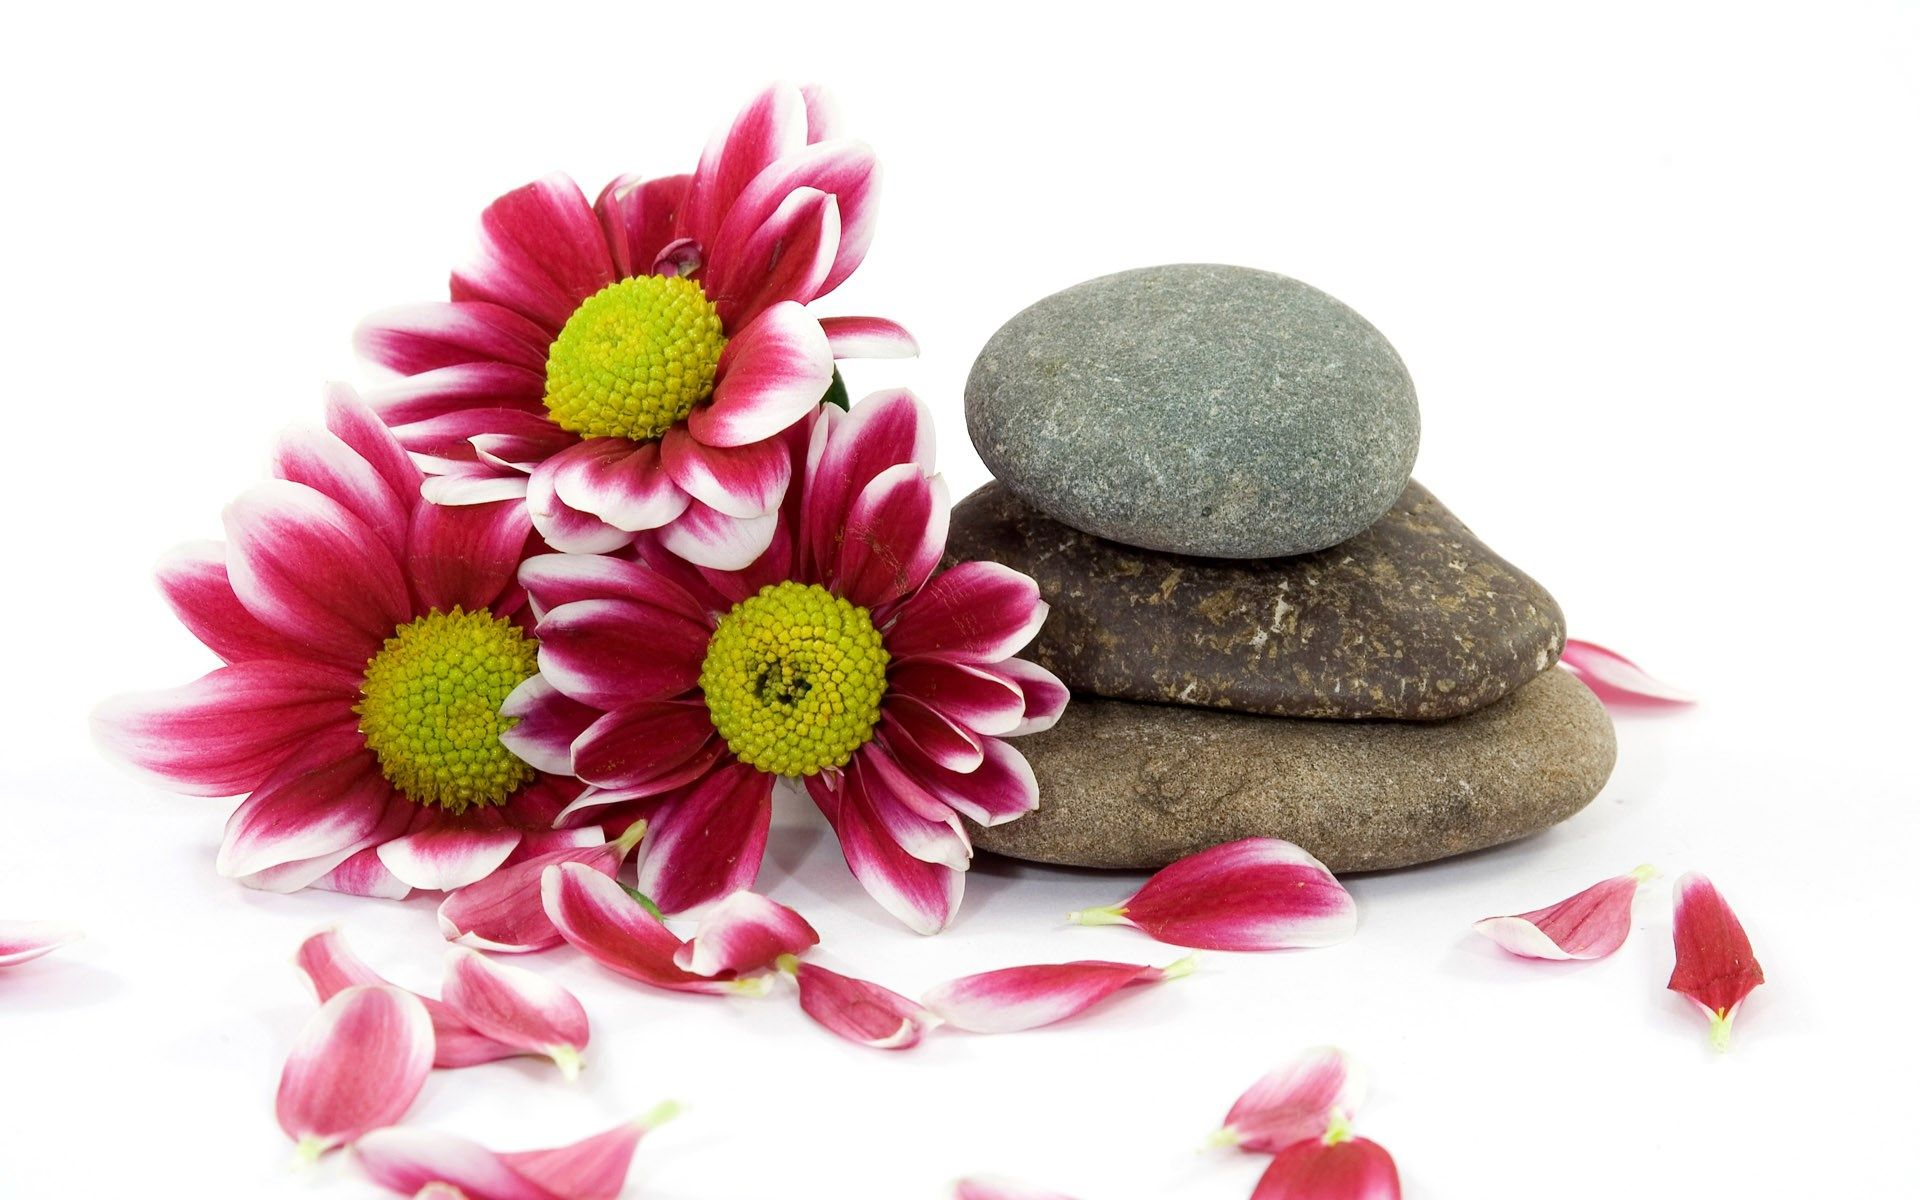 Free Screensaver Wallpapers For Still Life Stone Massage Stone Wallpaper Beauty Spa